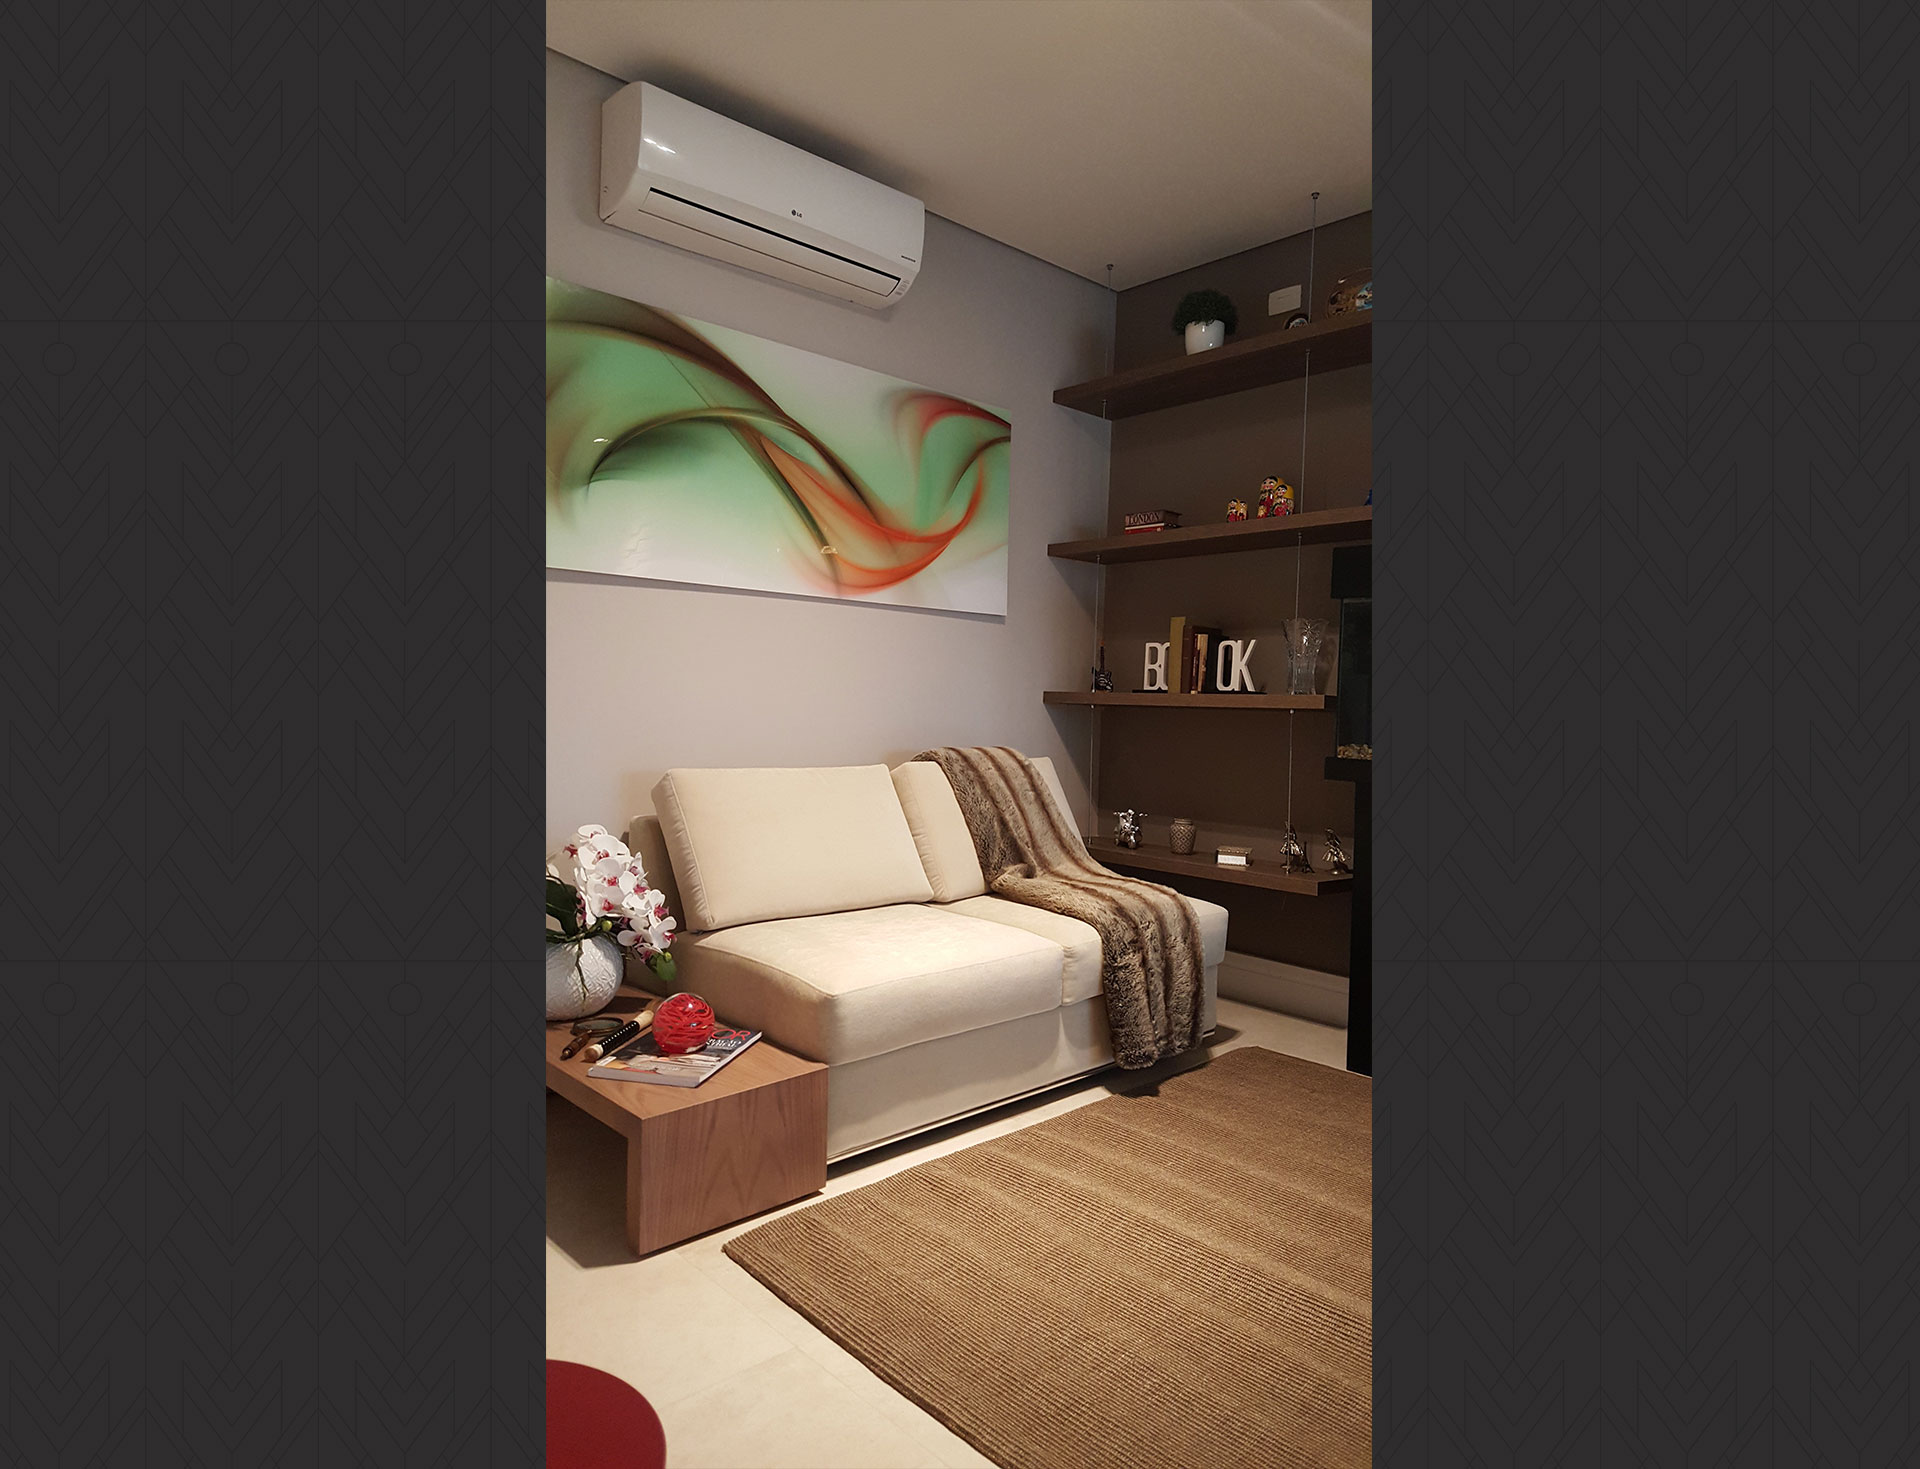 portfolio-cynthia-rolnik-apartamento4-03